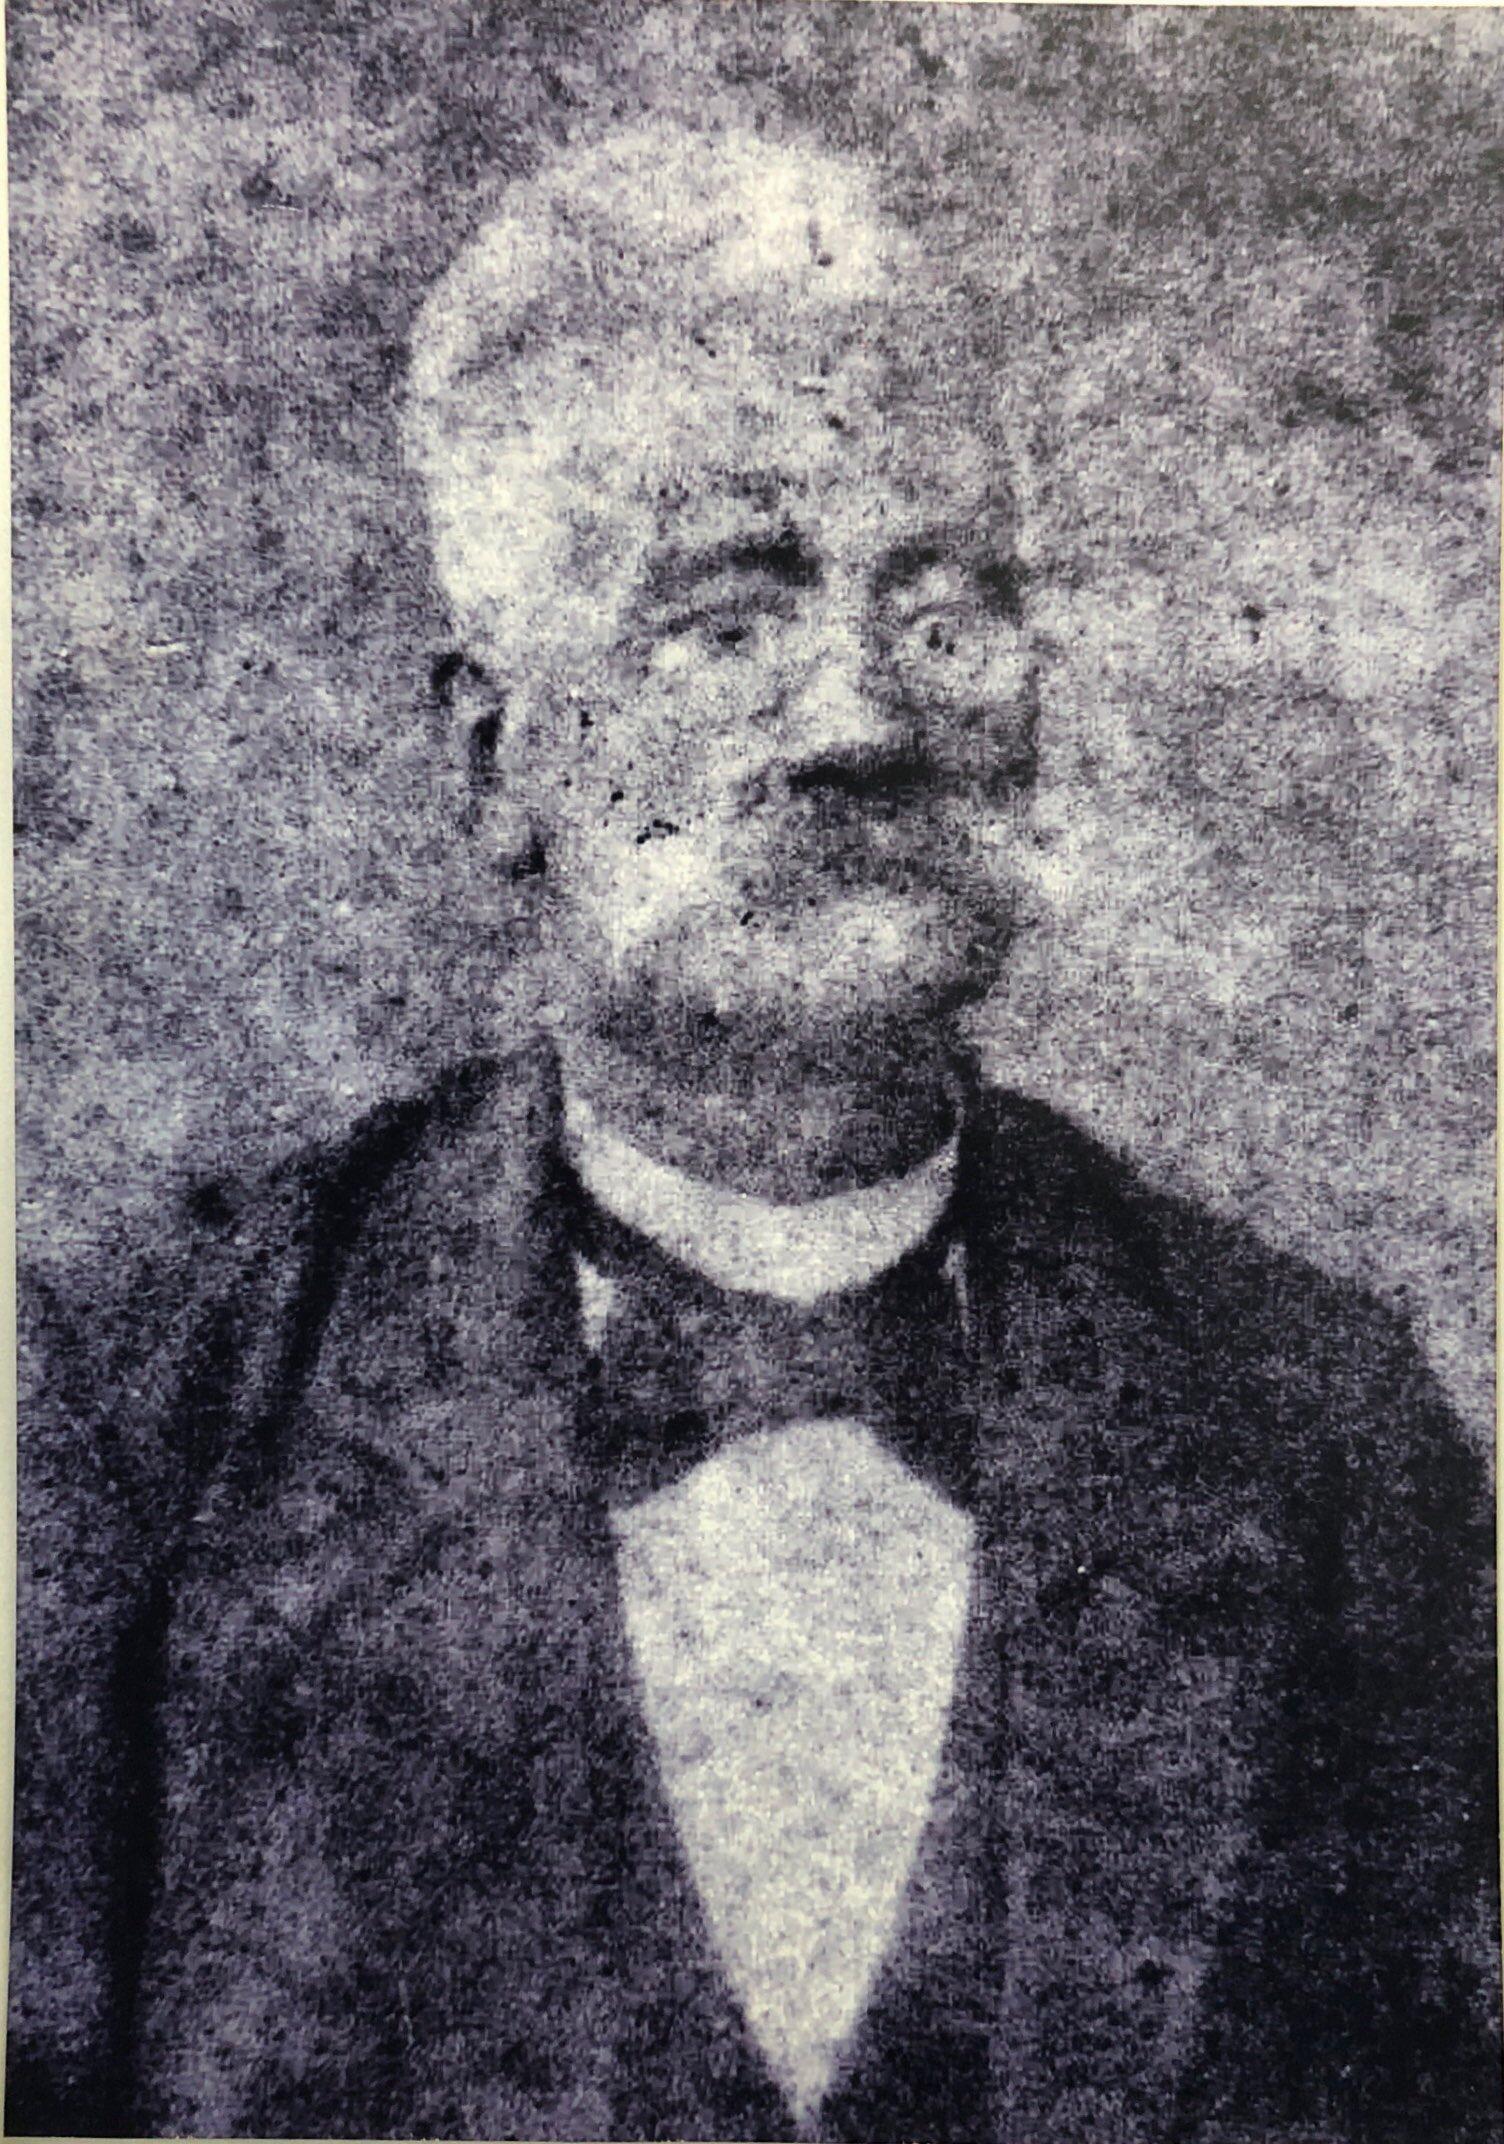 Antônio de Almeida Cotta (23/03/1891 - 10/12/1891)